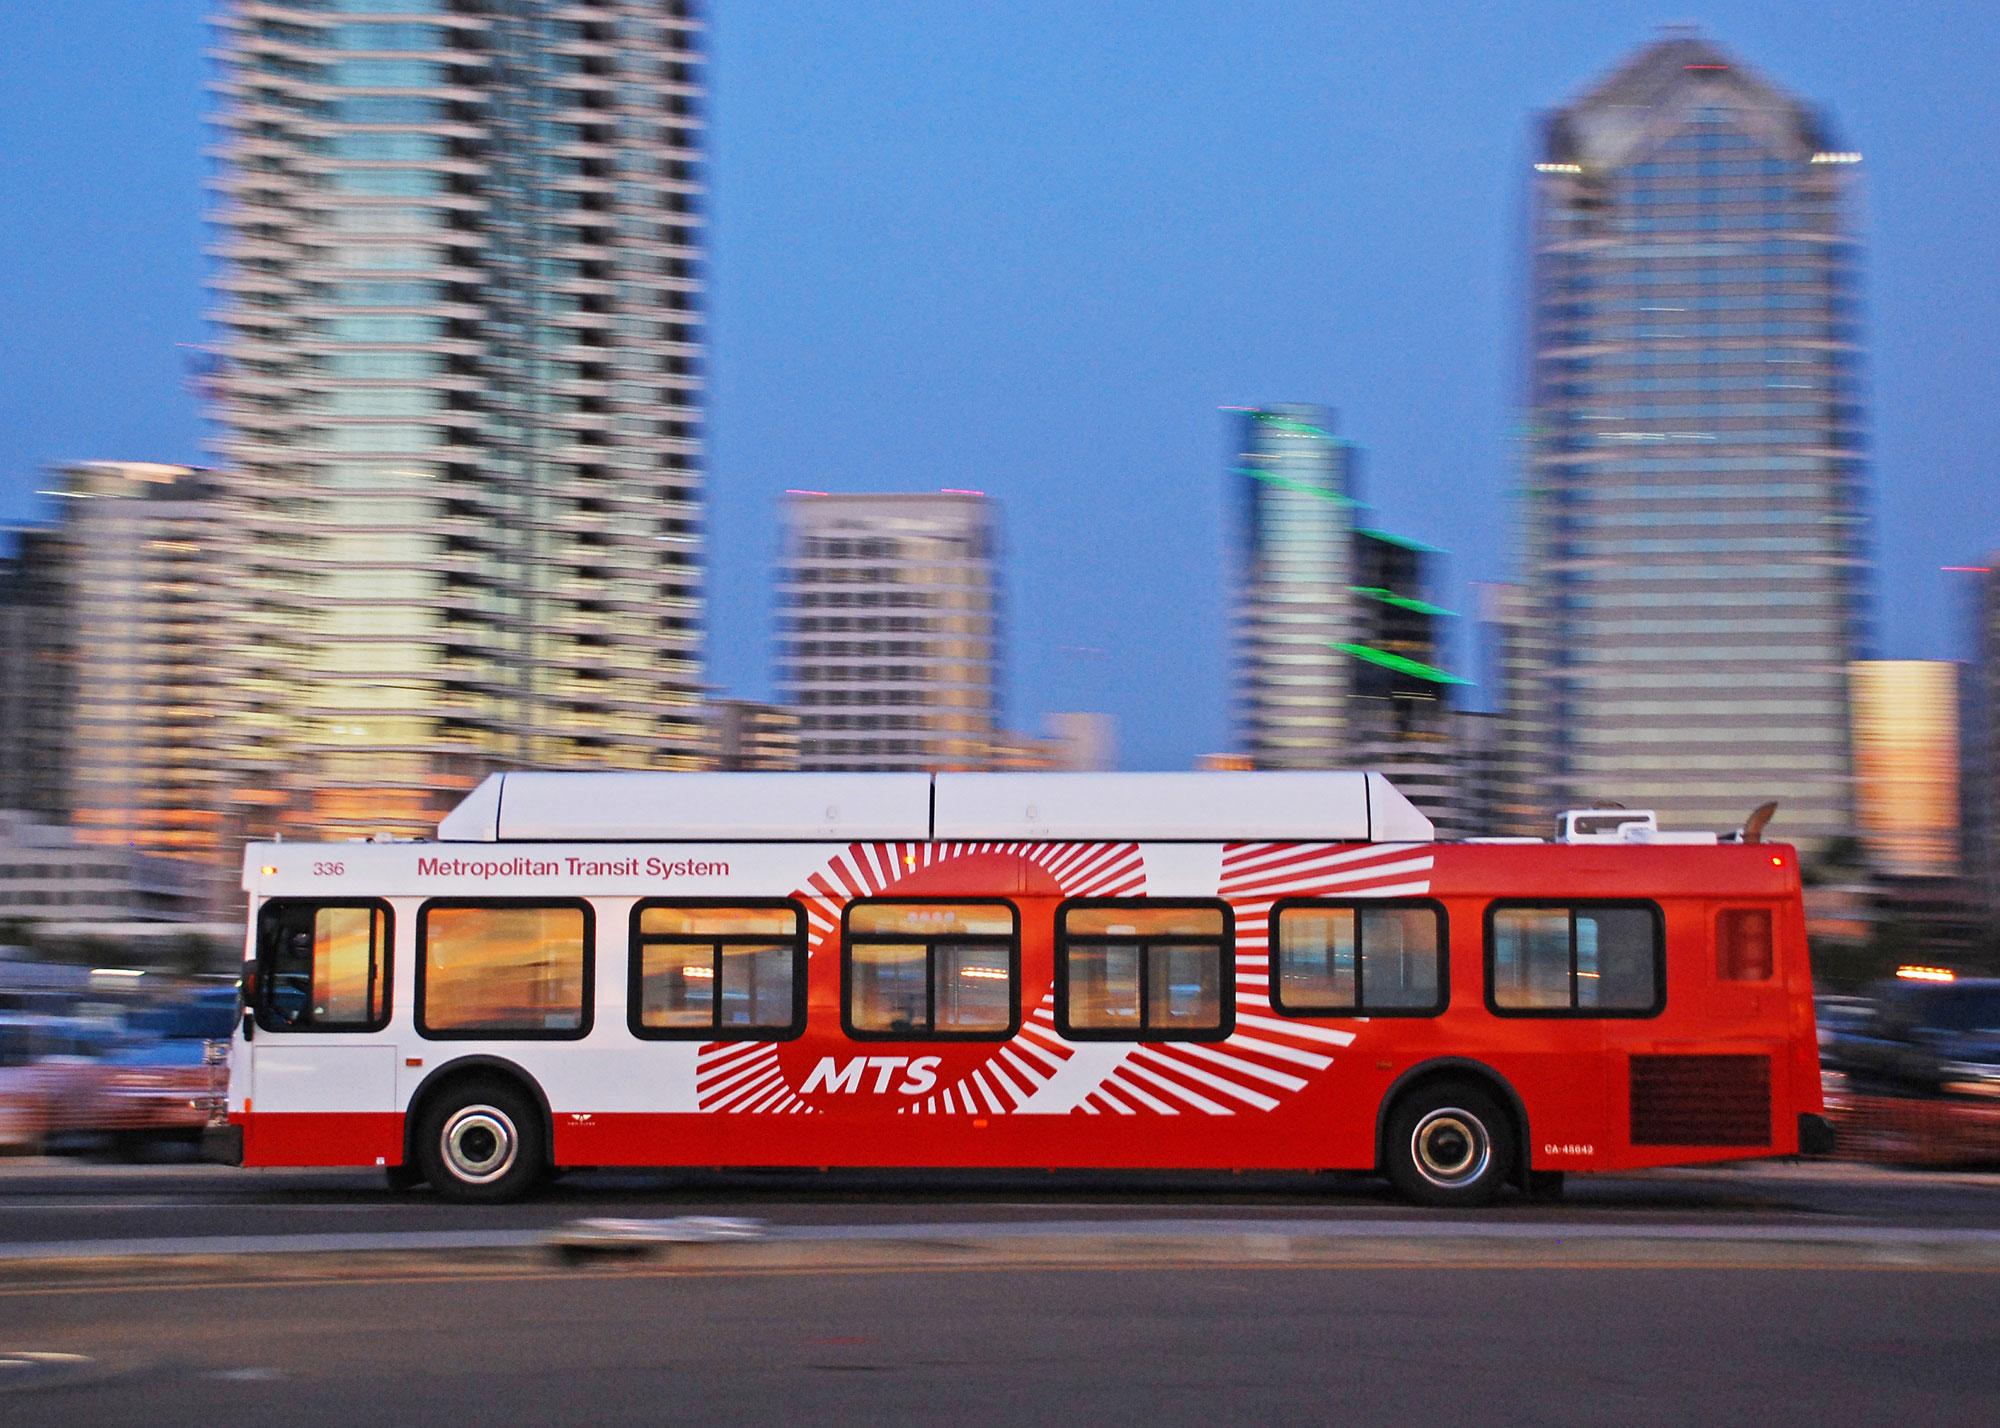 ron-miriello-grafico-mts-bus-san-diego-trolley-design-branding-07jpg